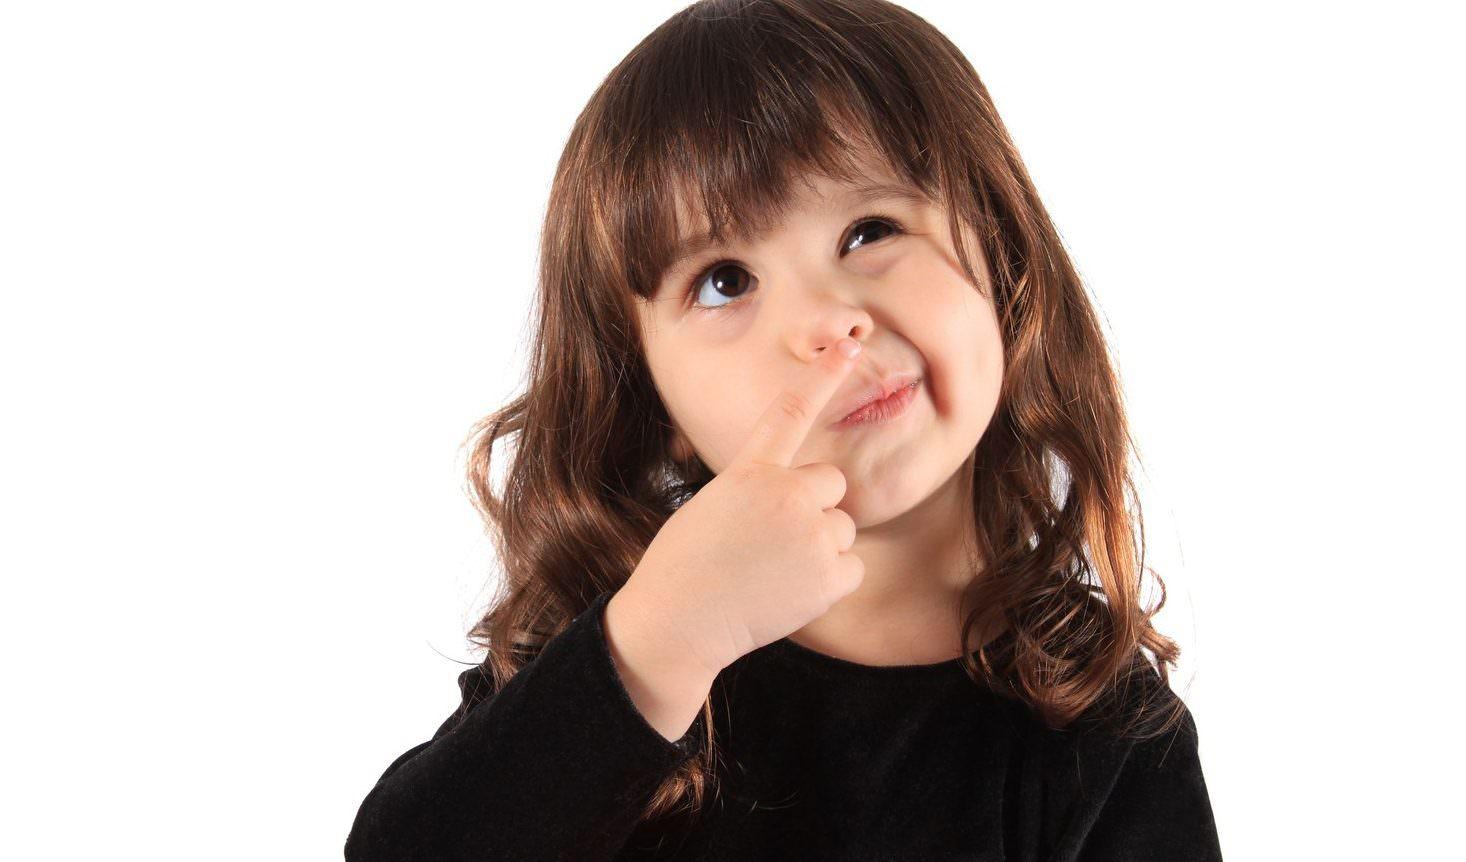 Признаки болезни у детей